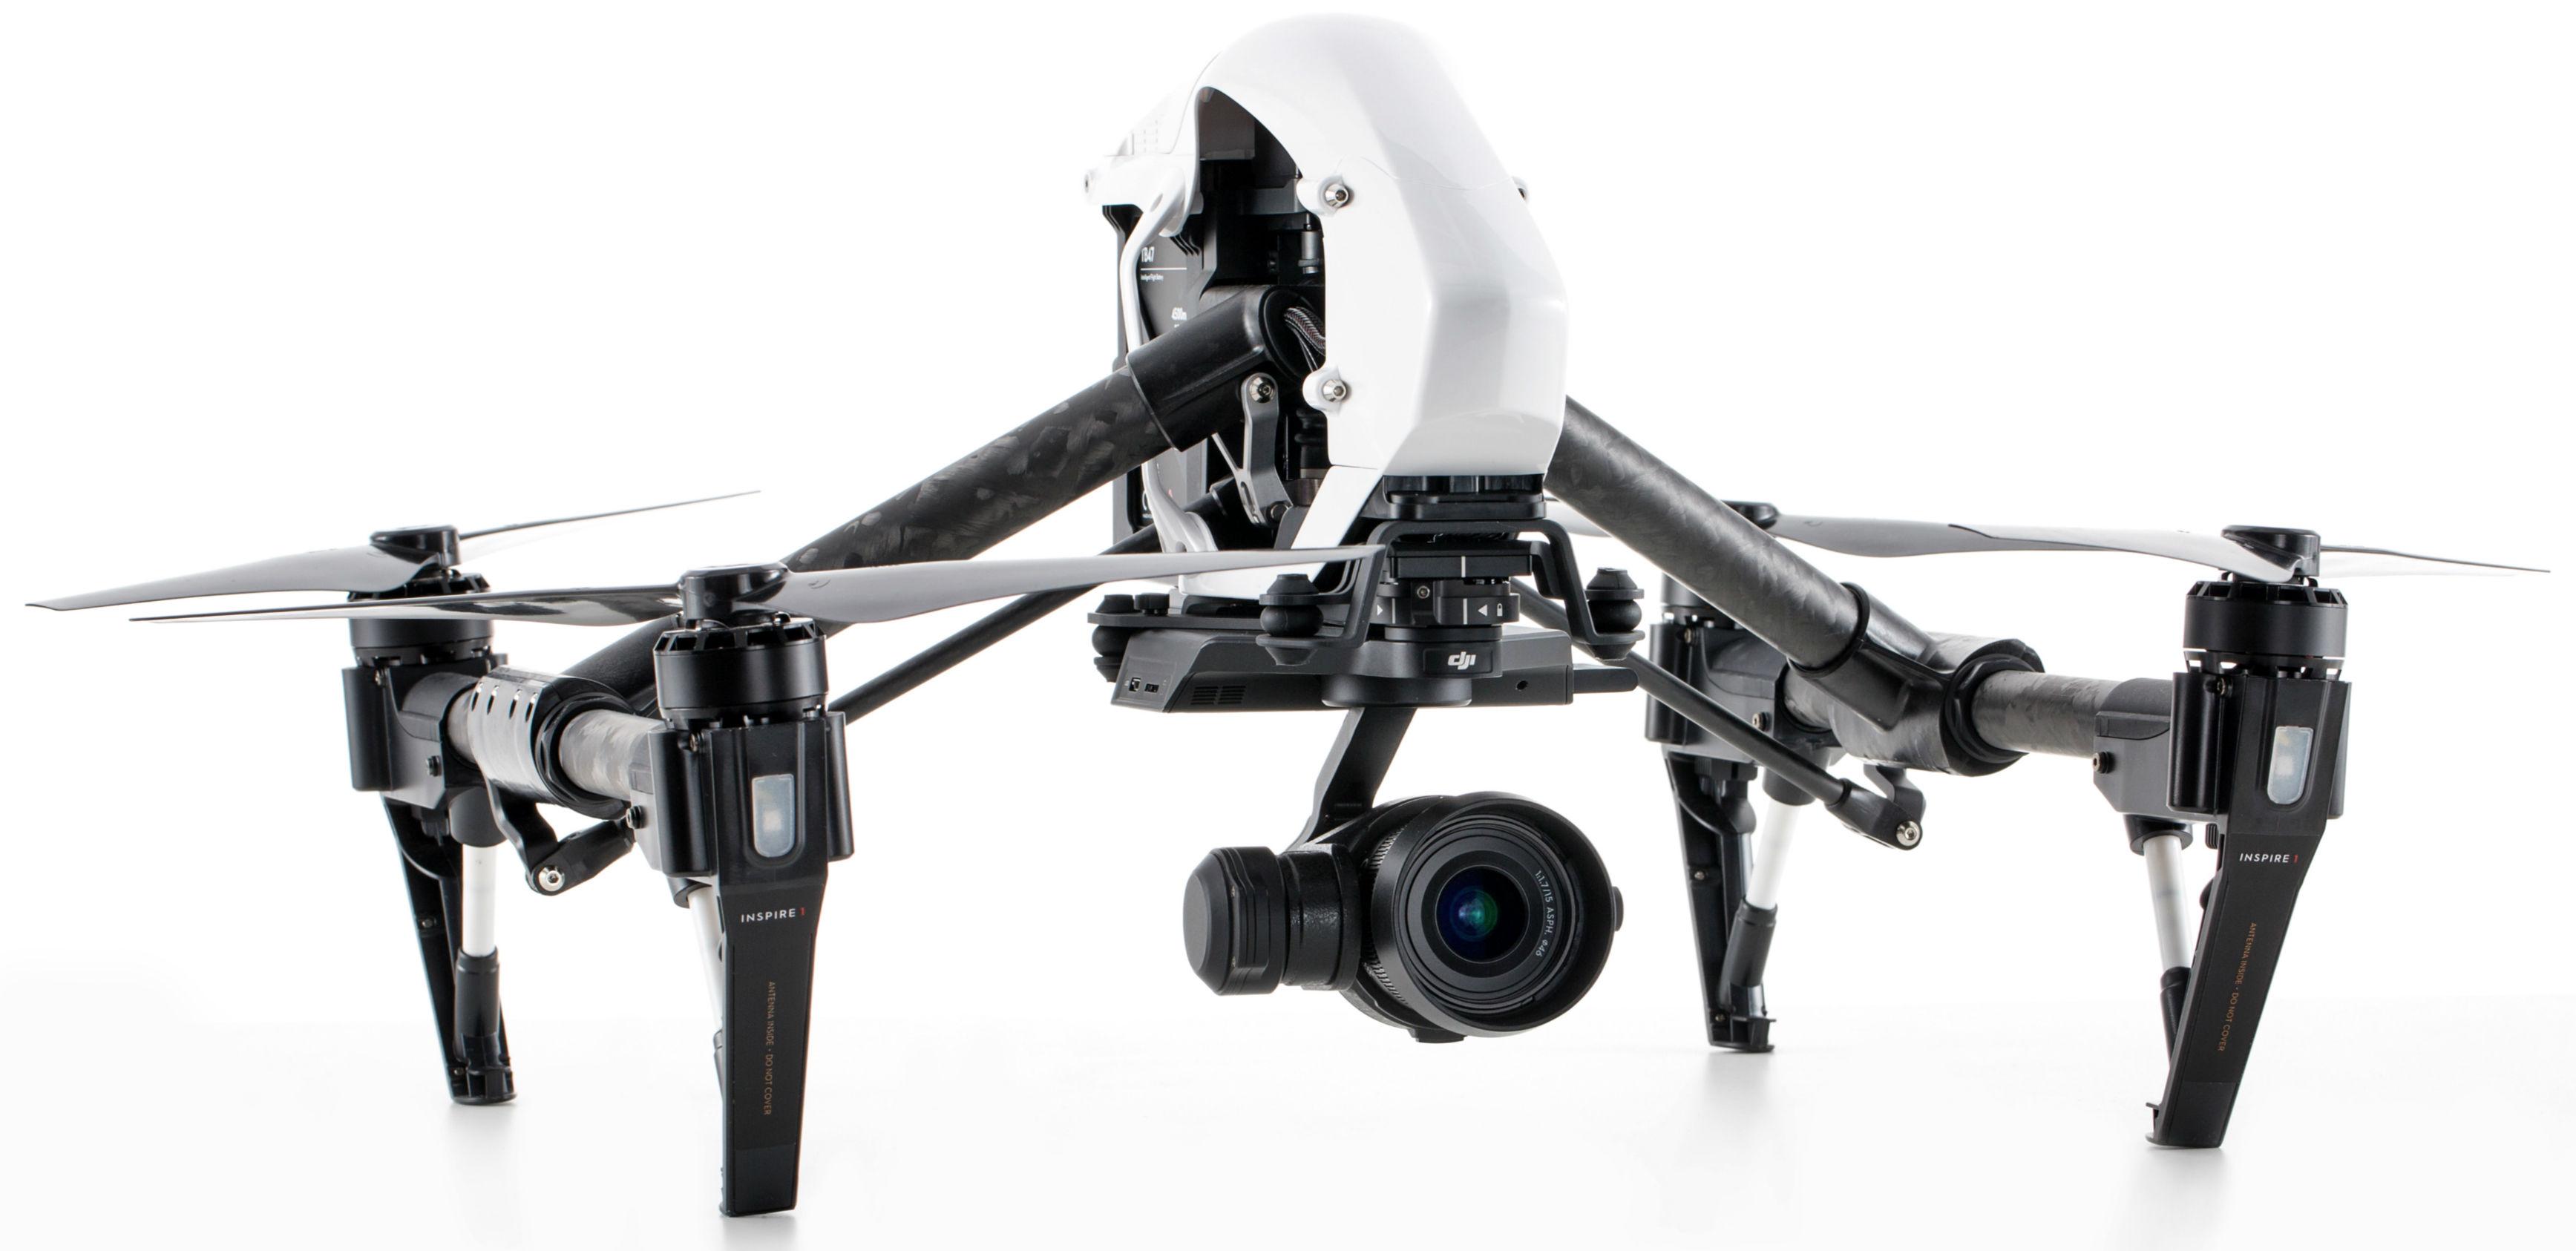 DJI 发布新款航拍相机禅思 X5 及 X5R